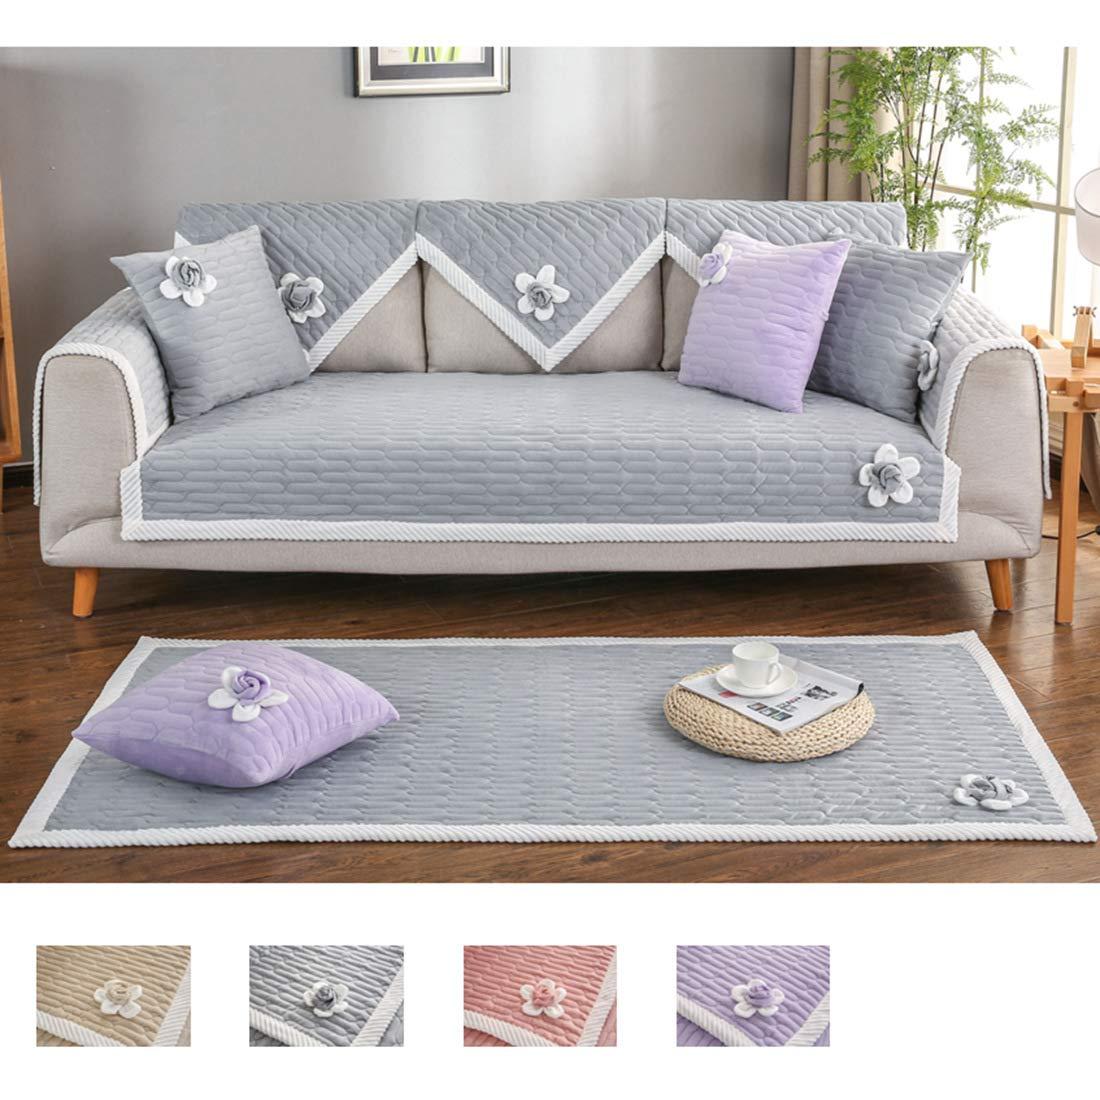 Royhom Velvet Minky Lovely Flowers Slipcover Protects Furniture from Kids Pets | Backrest and Armrest Sold Separately | Grey 35'' x 94''